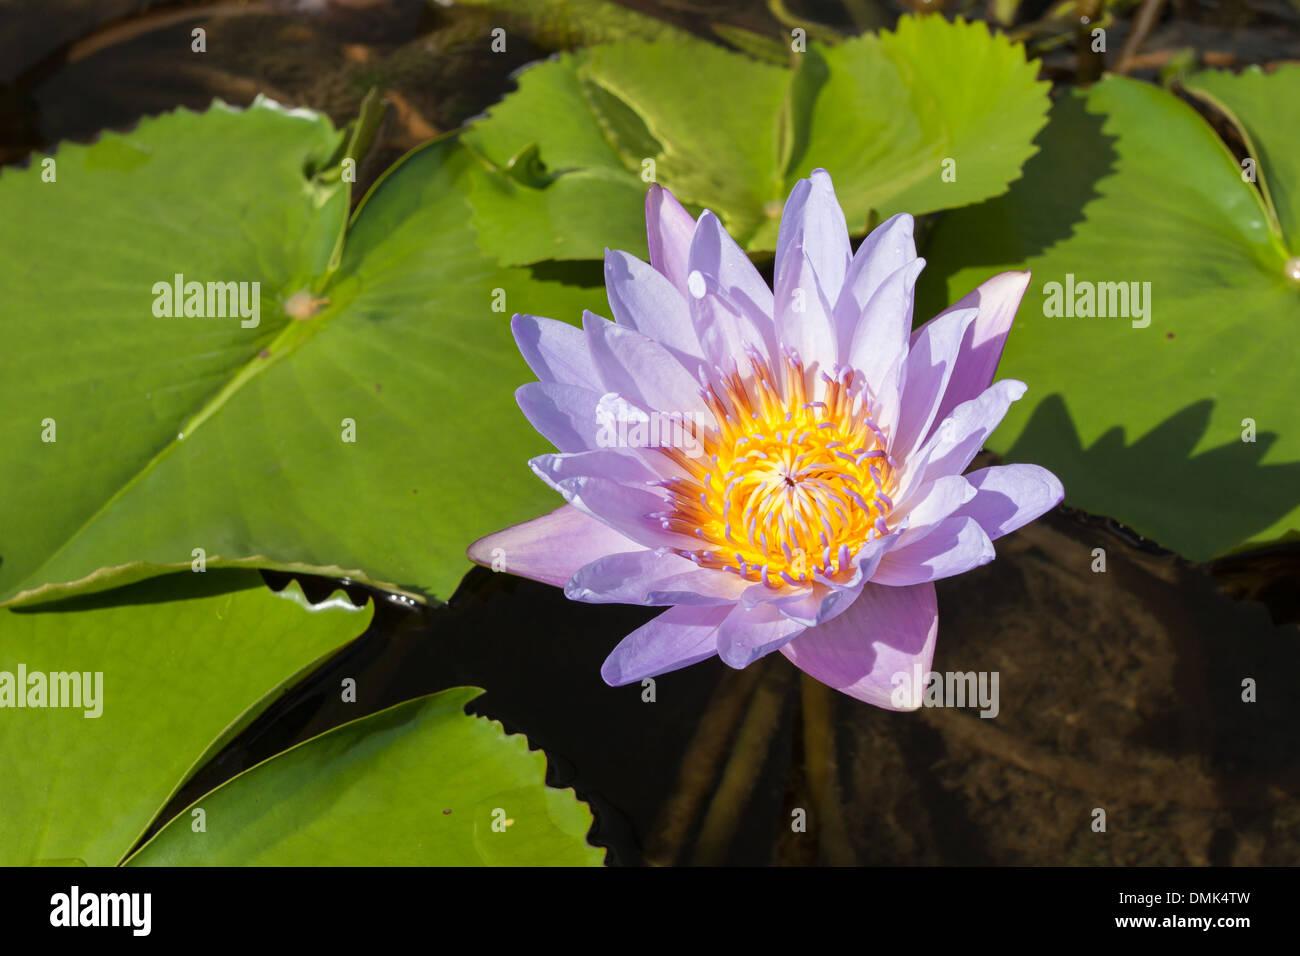 Lotus Flower Art Stock Photos Lotus Flower Art Stock Images Alamy